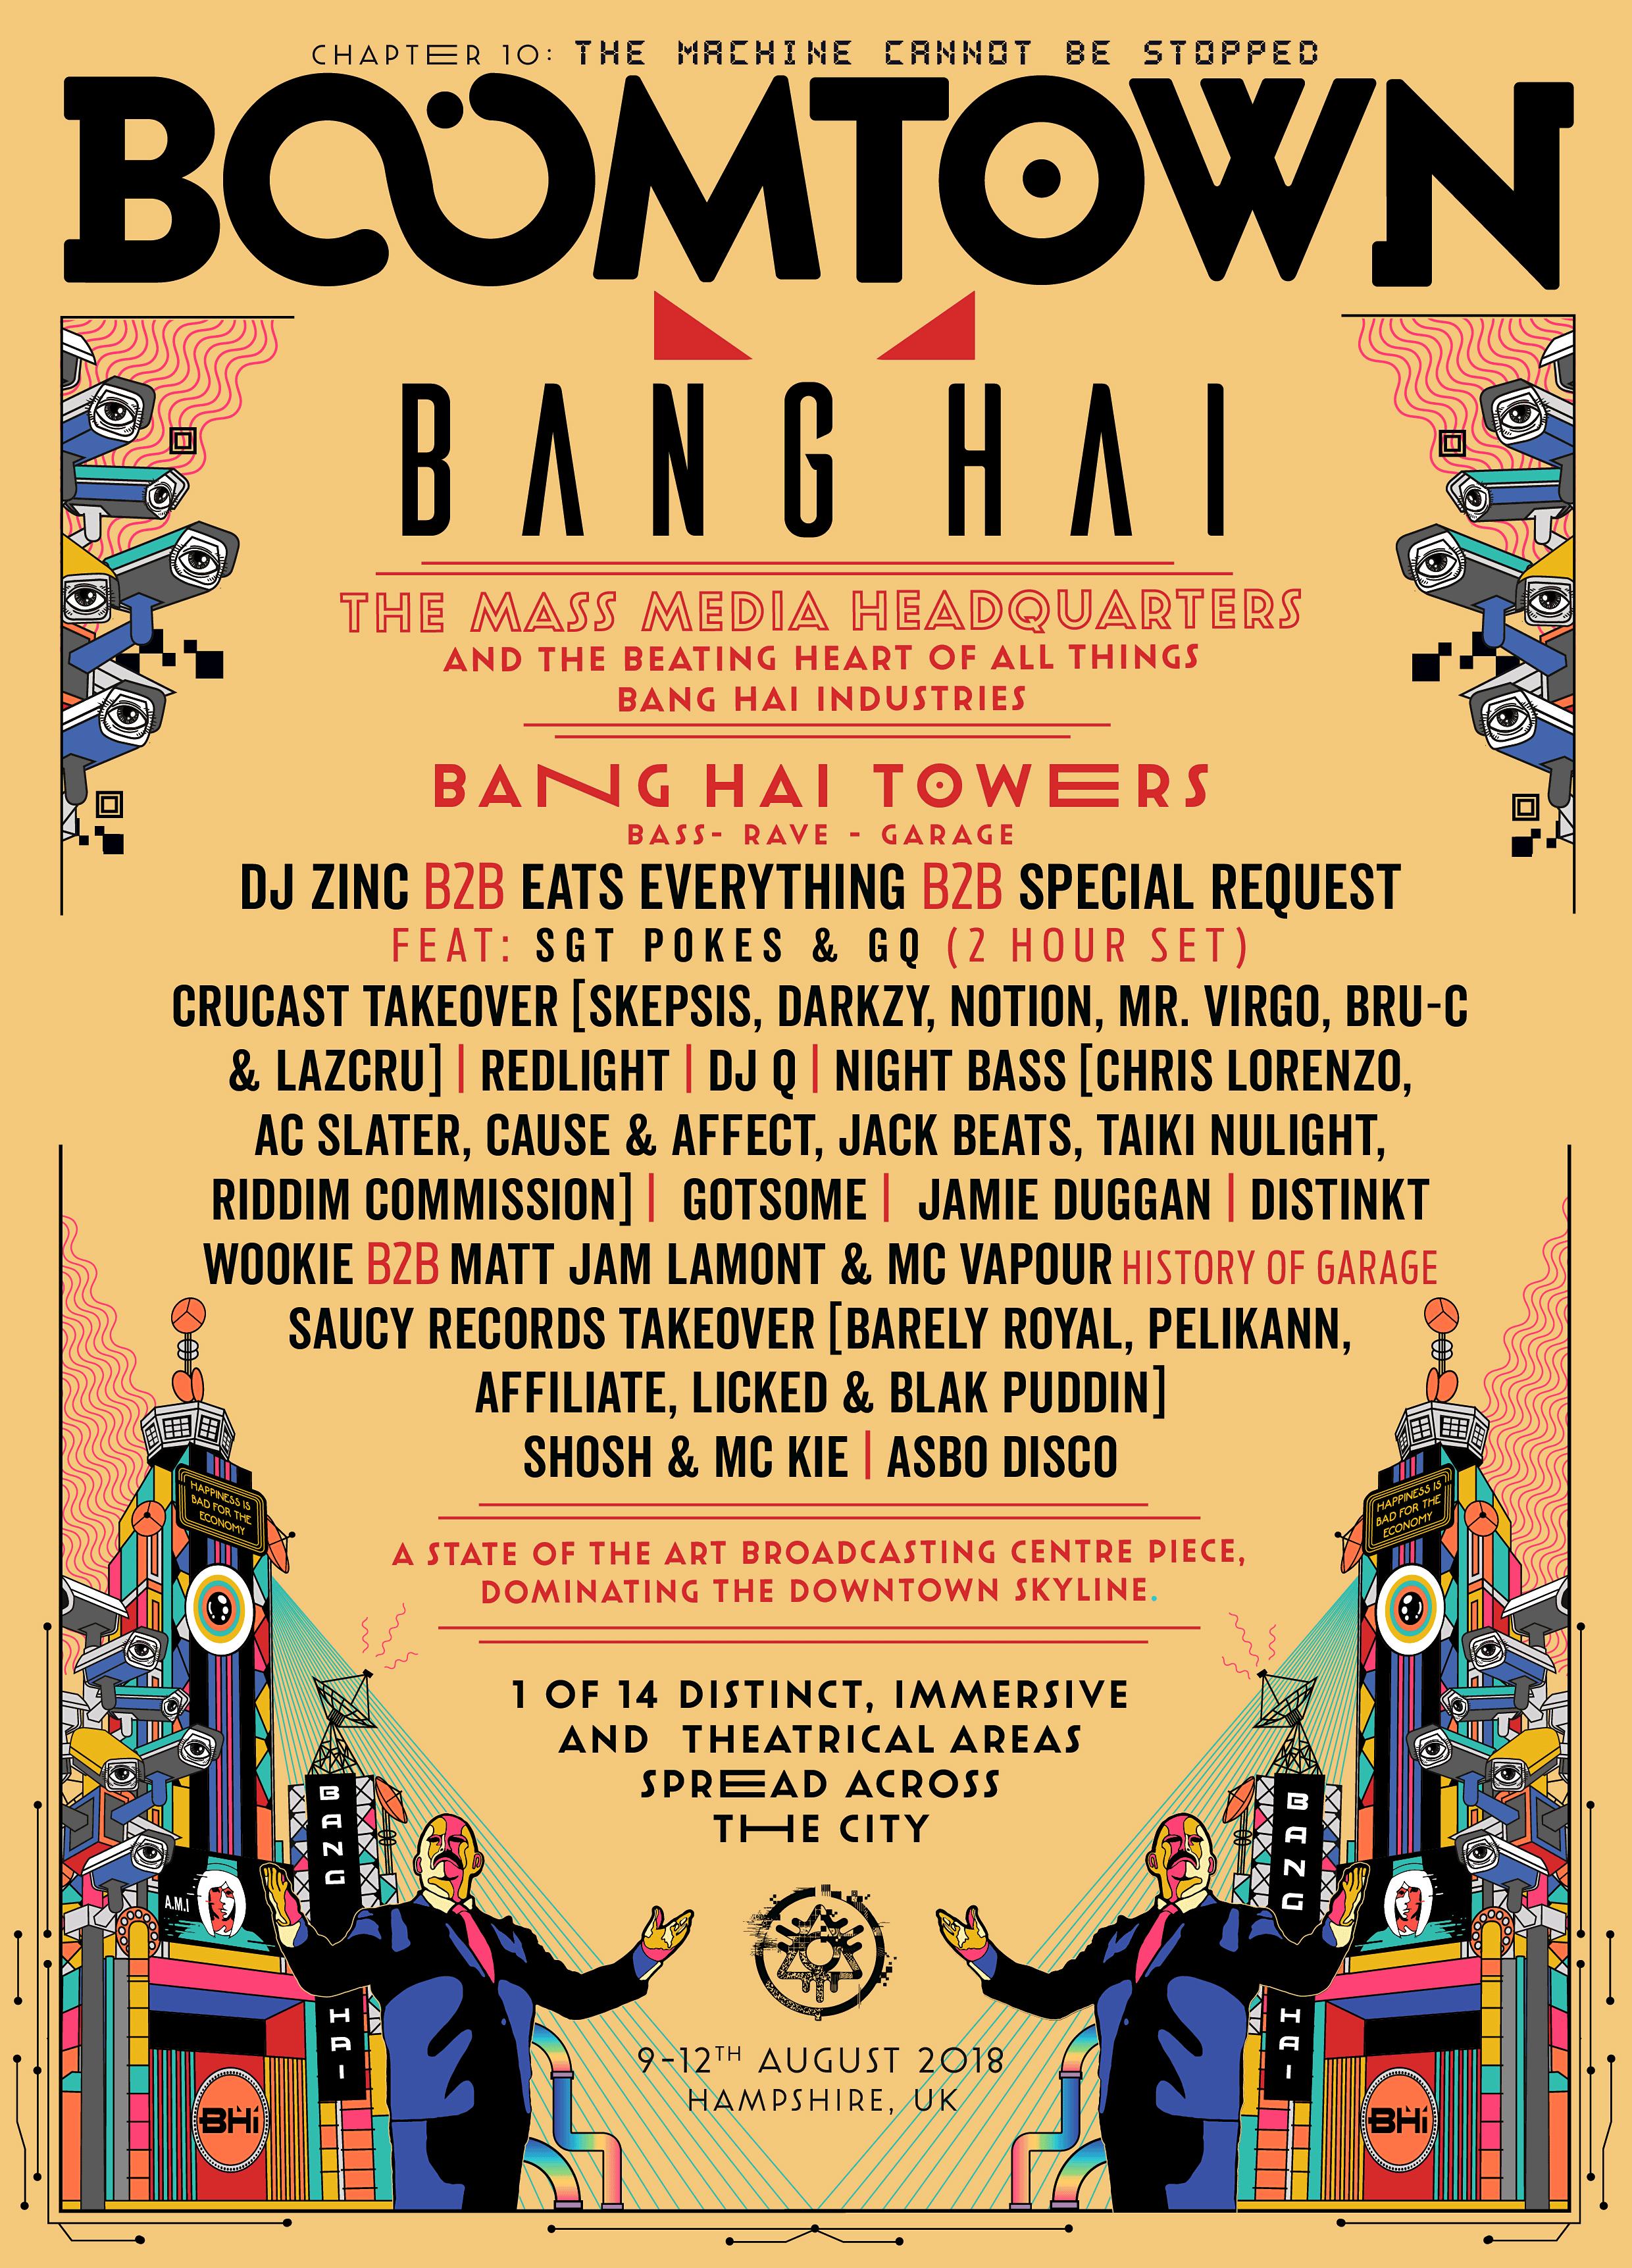 Banghai.png